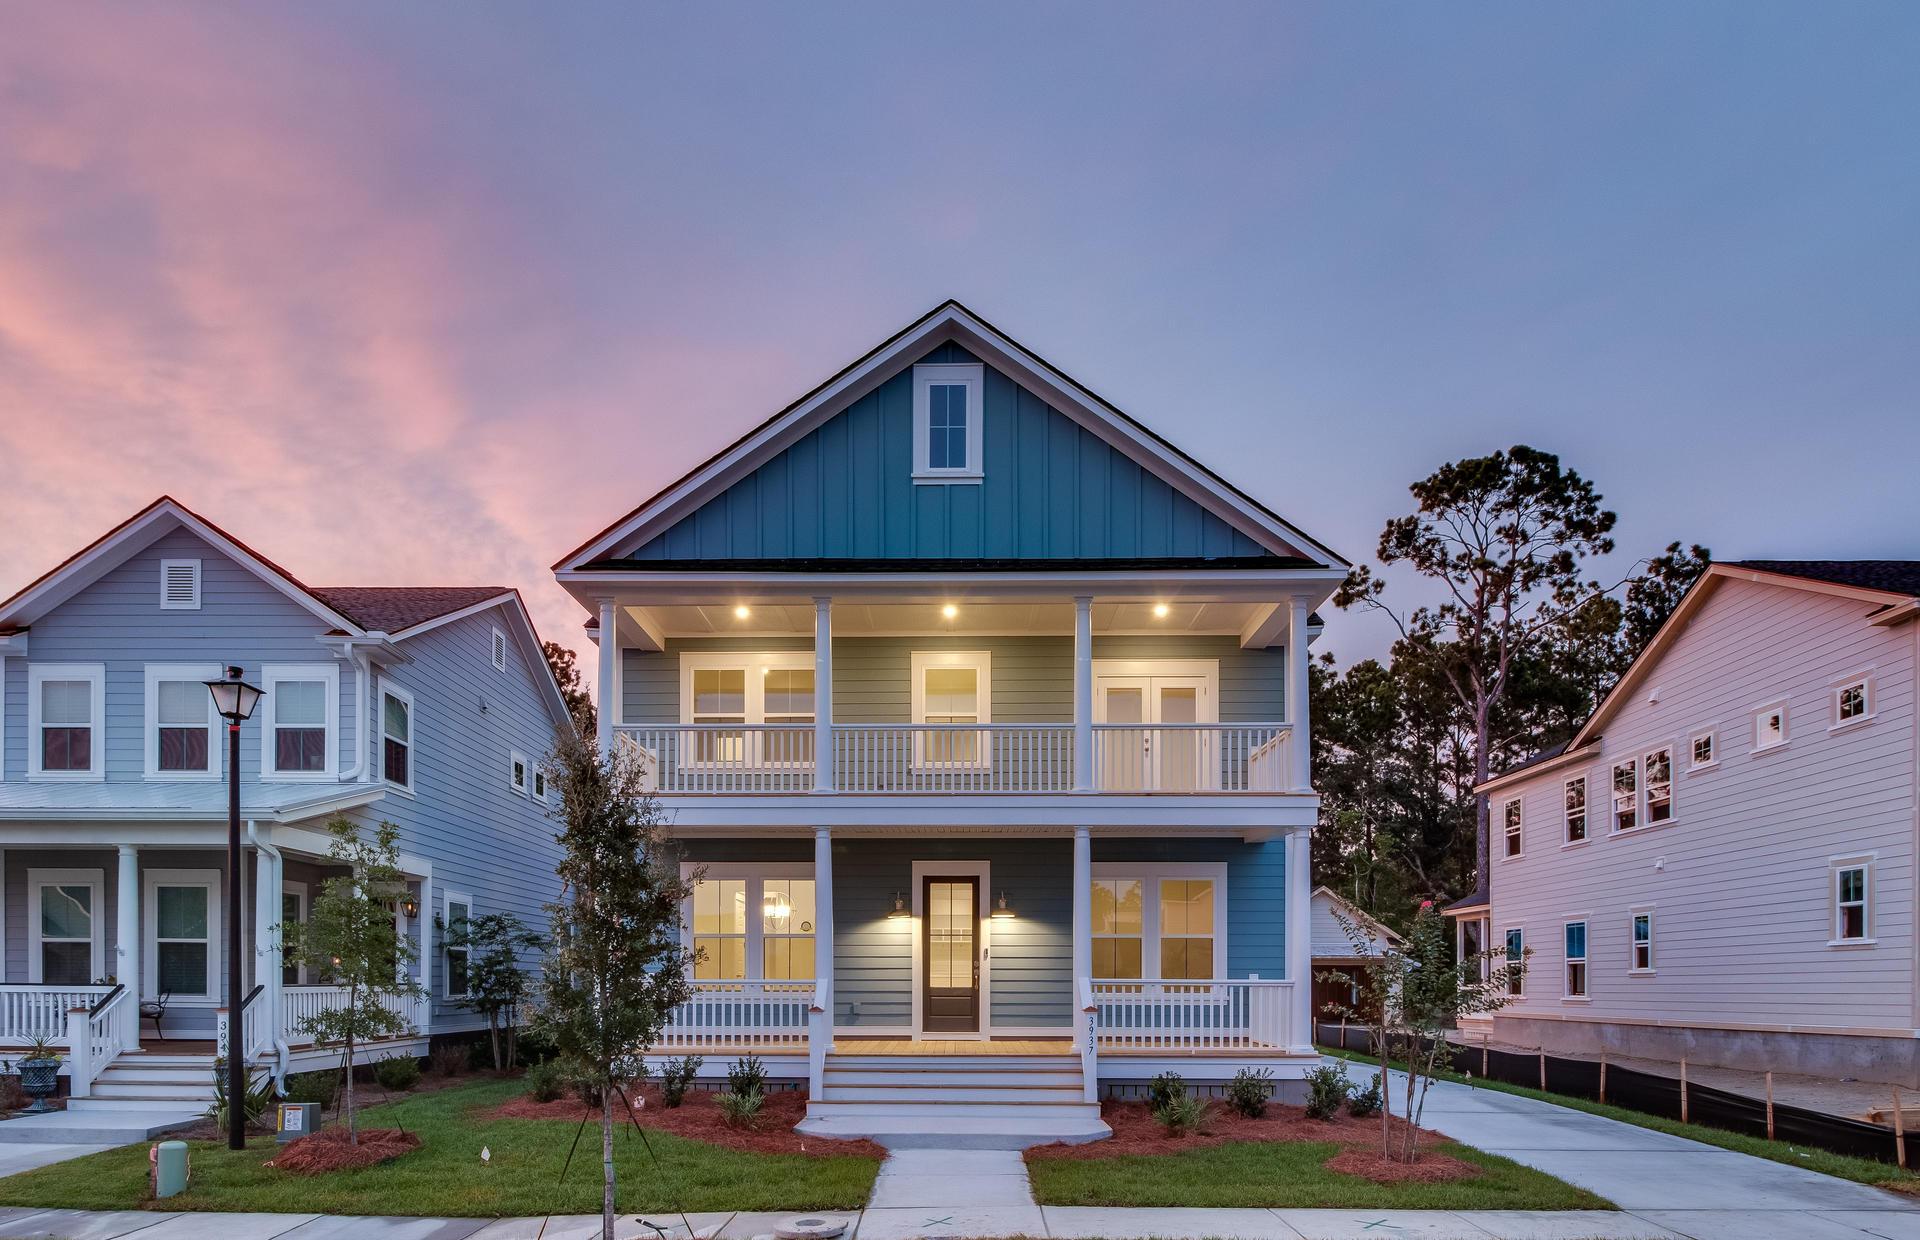 Carolina Park Homes For Sale - 1843 Agate Bay, Mount Pleasant, SC - 0